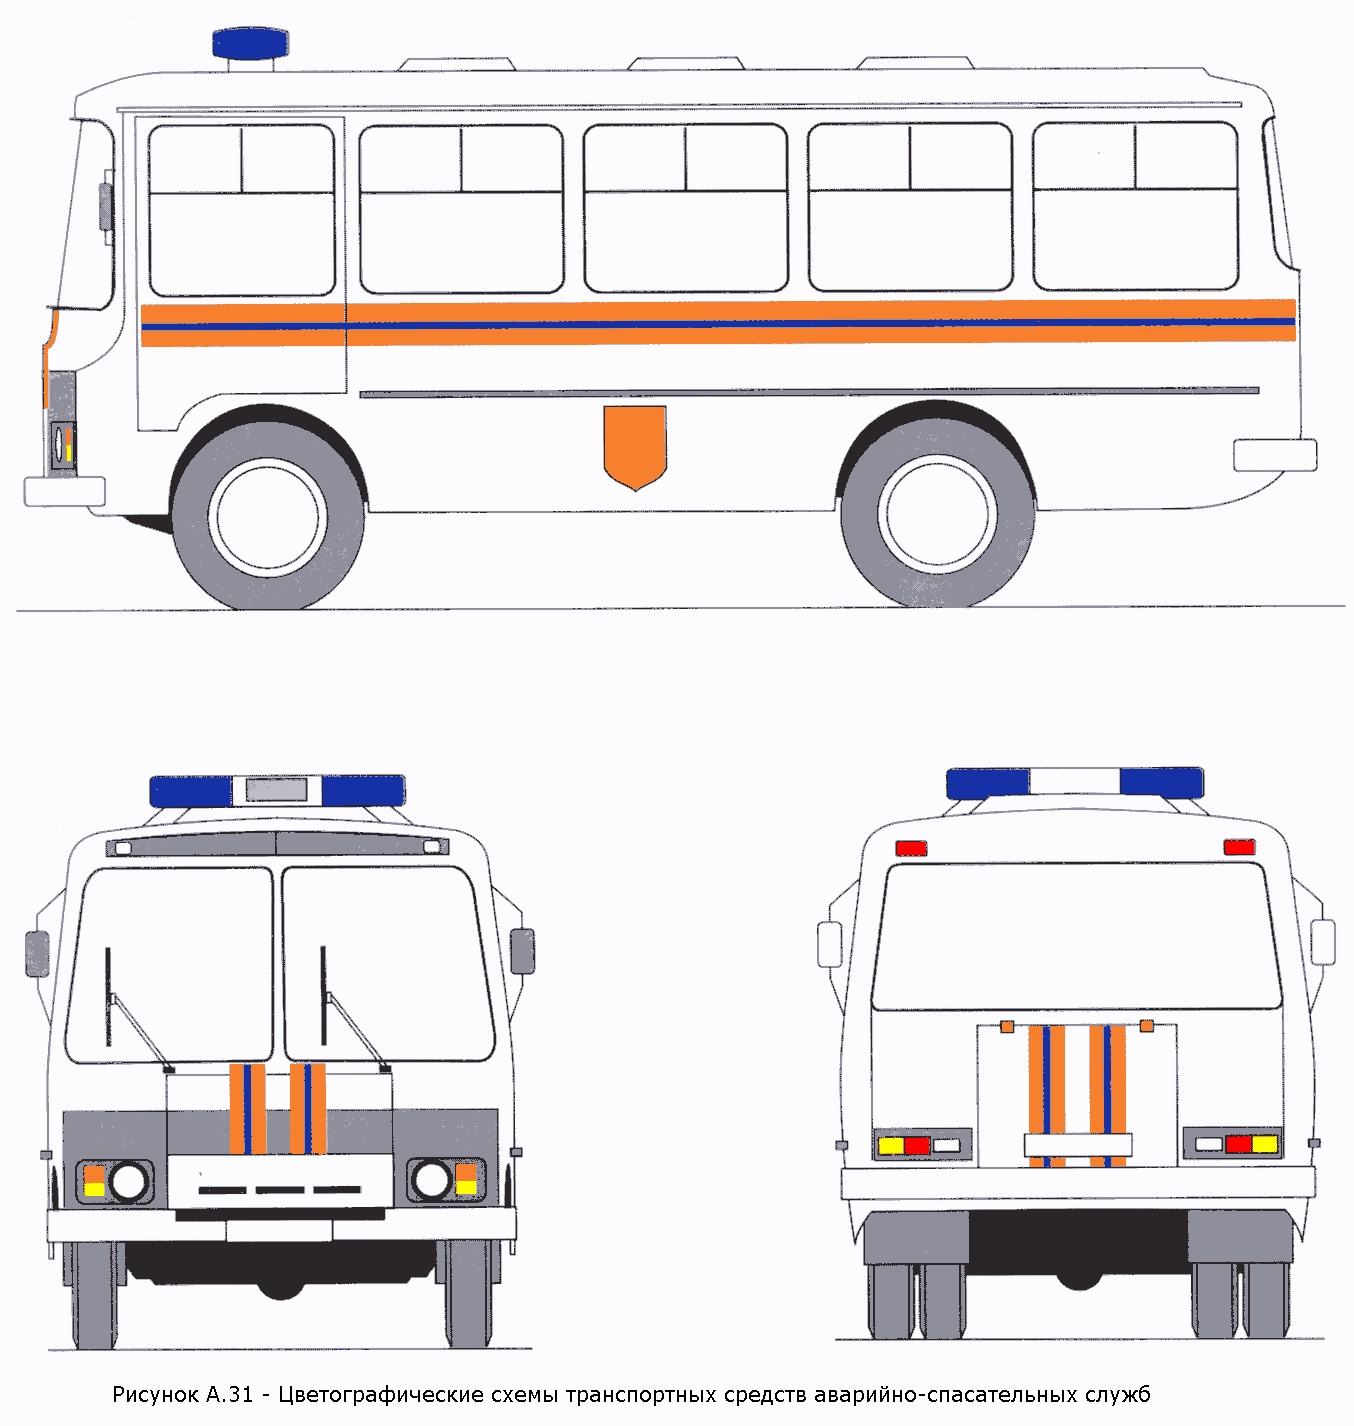 РИСУНОК А.31 (К ГОСТ Р 50574-2002)